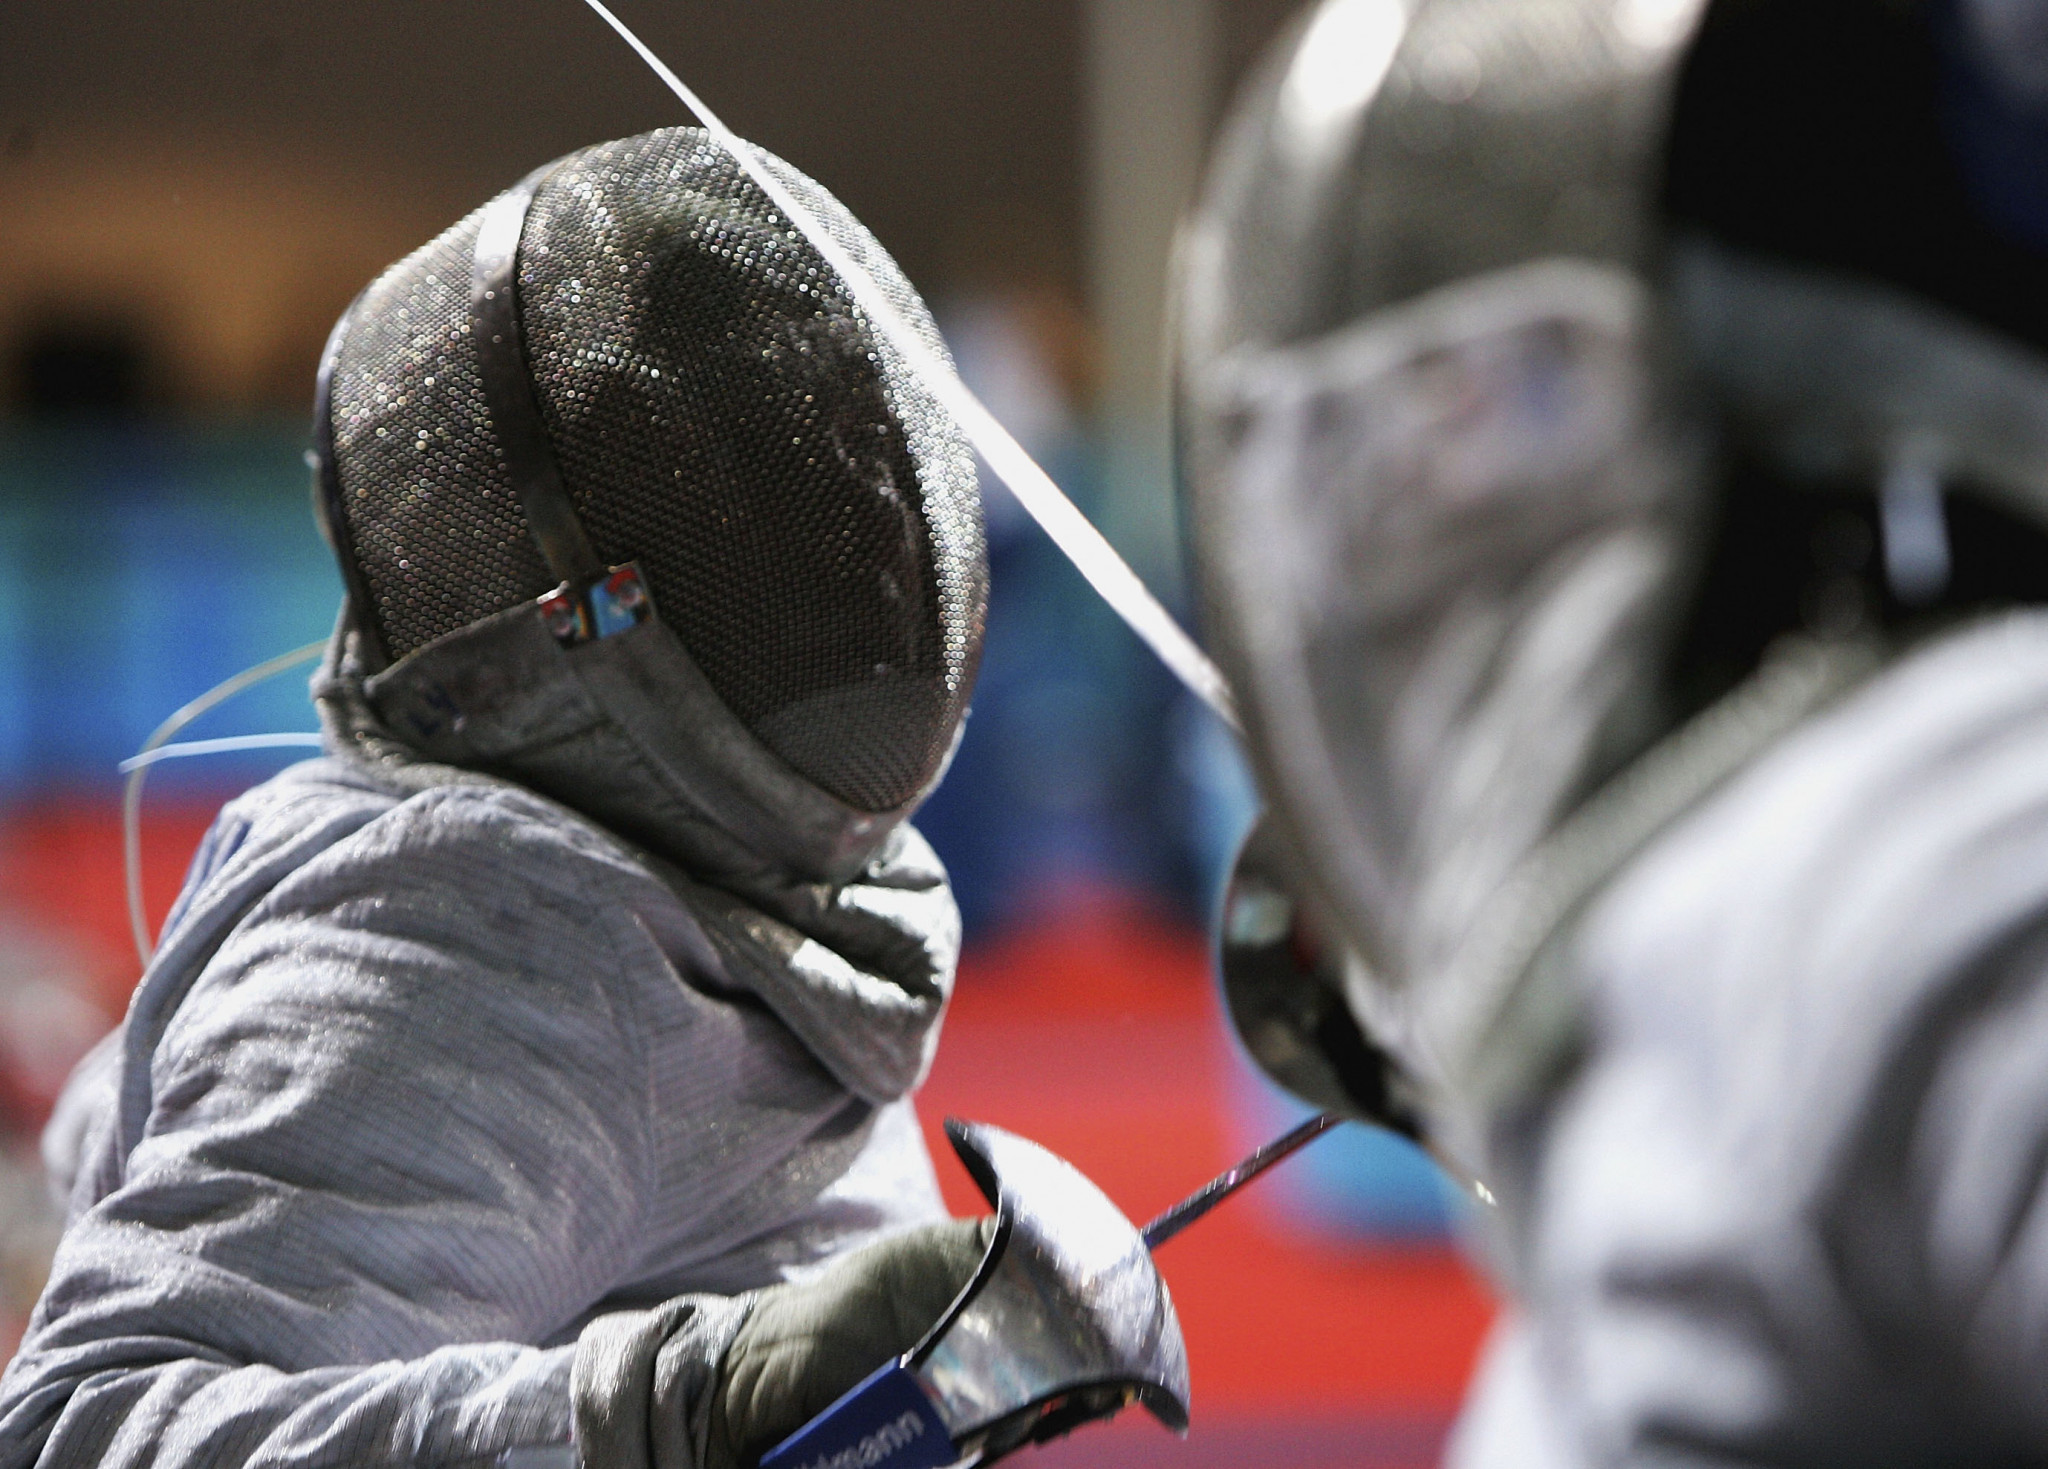 Dróżdż wins home gold at IWAS Wheelchair Fencing World Cup in Warsaw